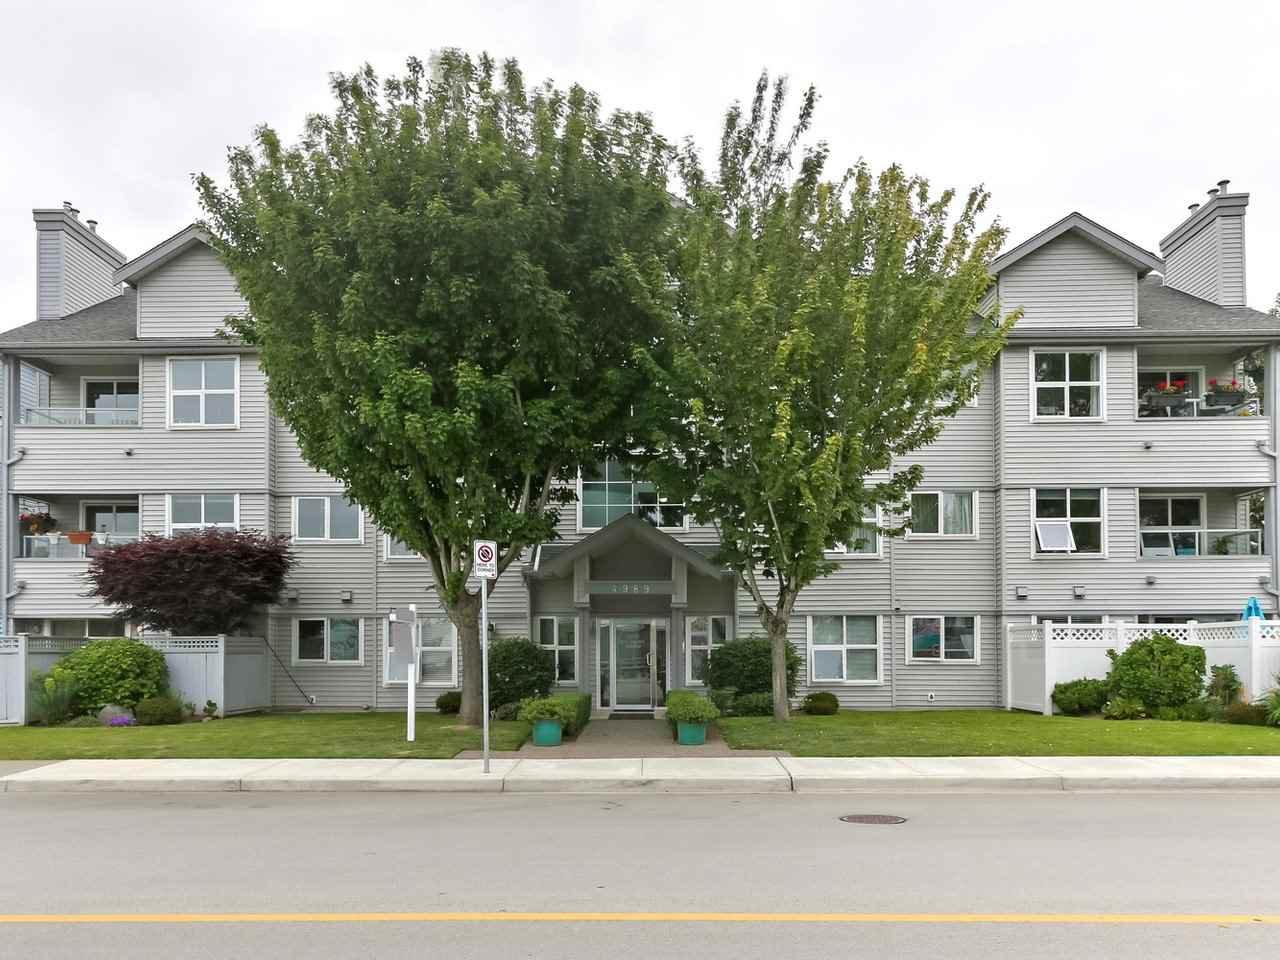 "Main Photo: 311 4989 47 Avenue in Delta: Ladner Elementary Condo for sale in ""PARK REGENT ESTATES"" (Ladner)  : MLS®# R2421936"